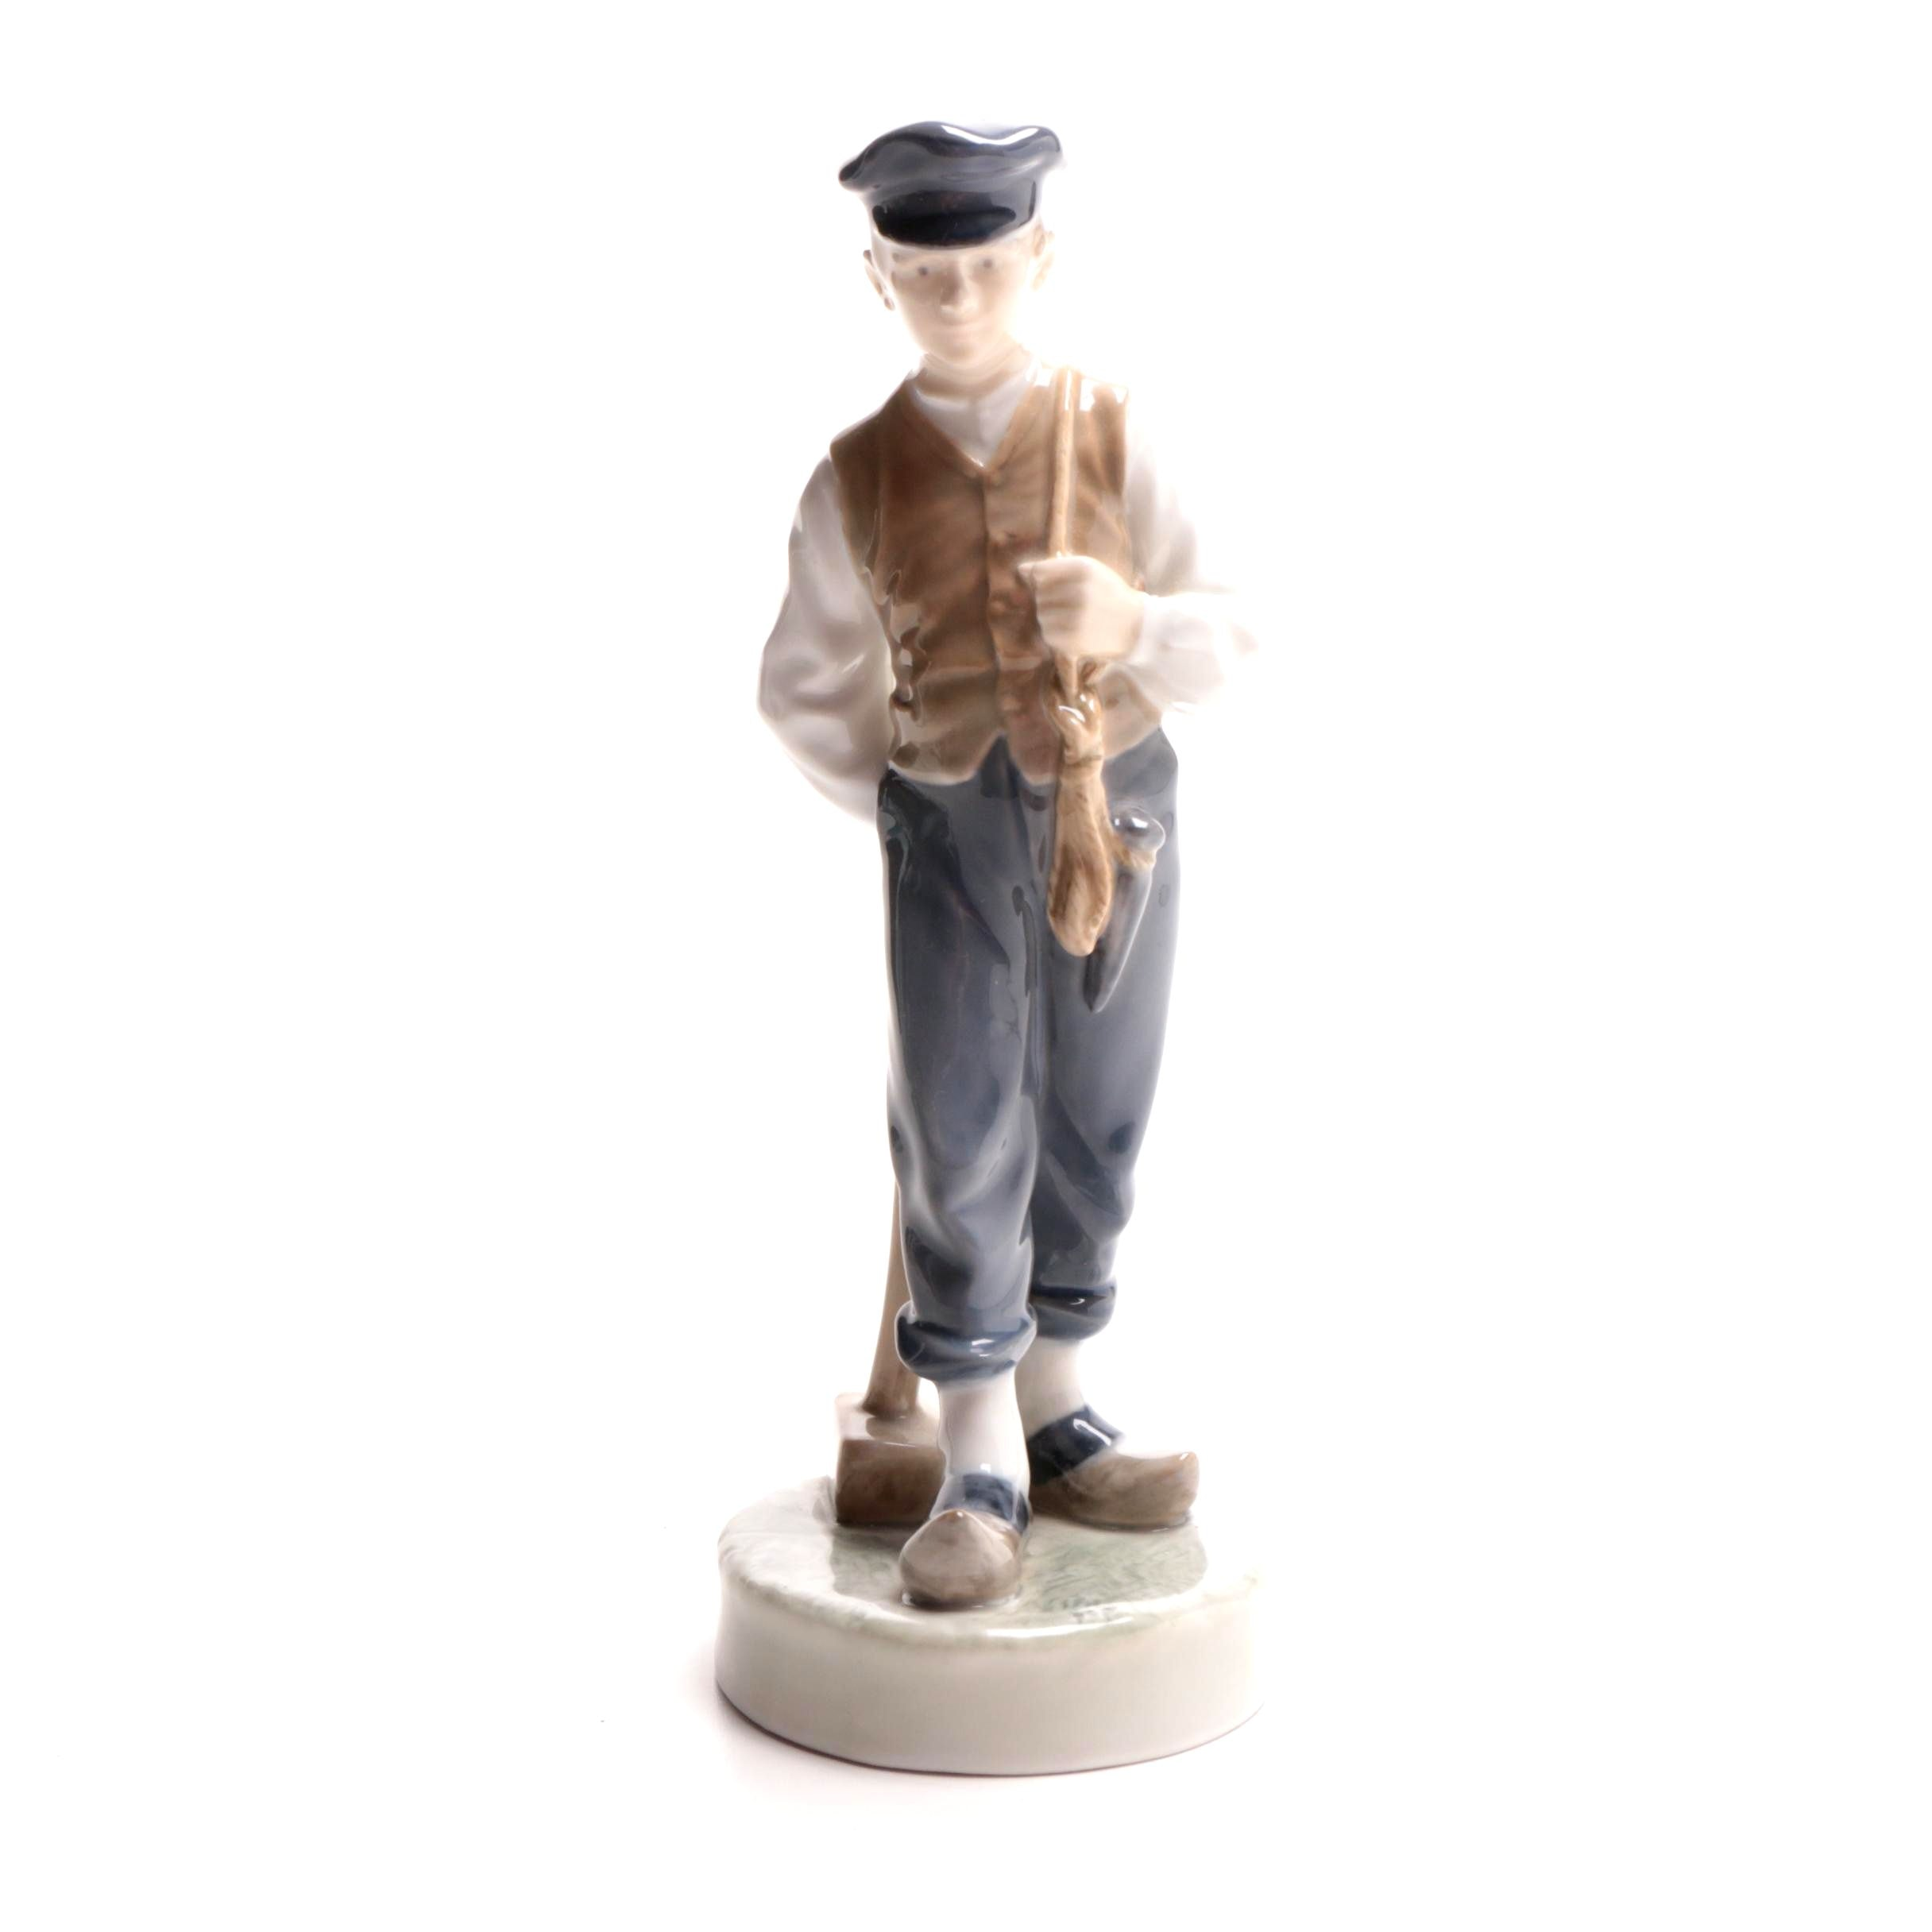 "Royal Copenhagen Hand-Painted ""Farmer Boy with Hammer"" Porcelain Figurine"